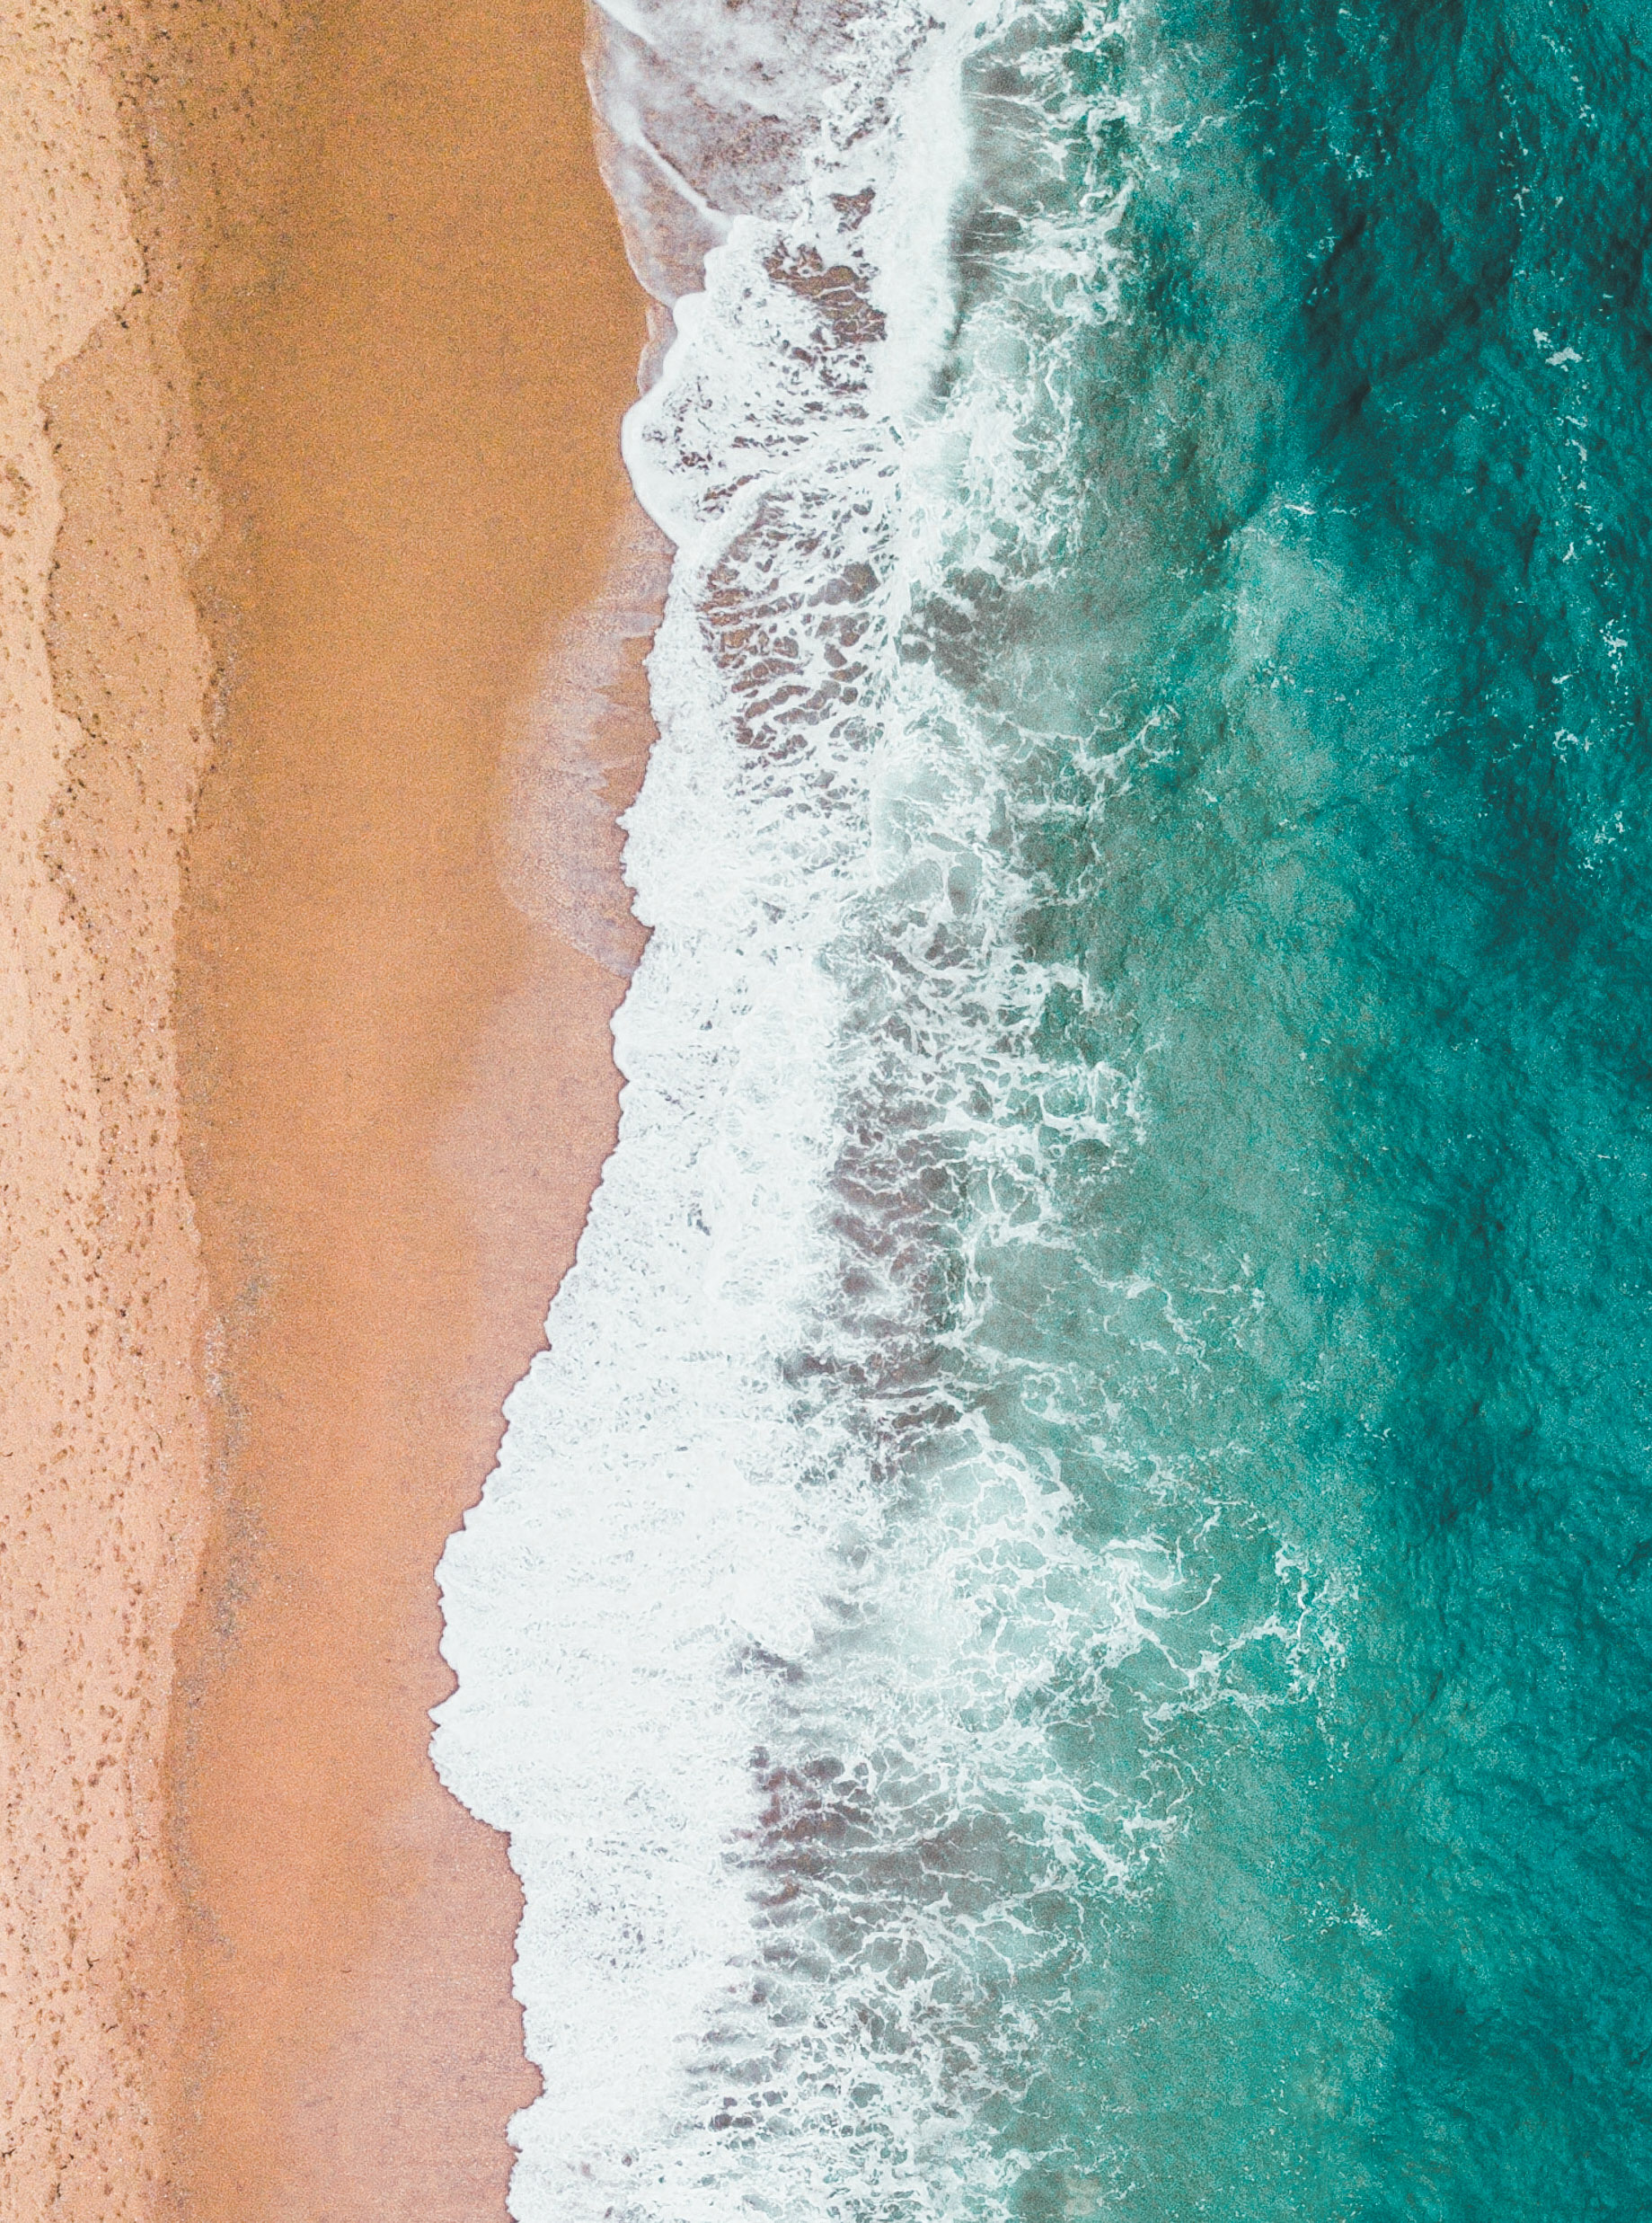 android-wallpaper-beach-foam-533923.jpg